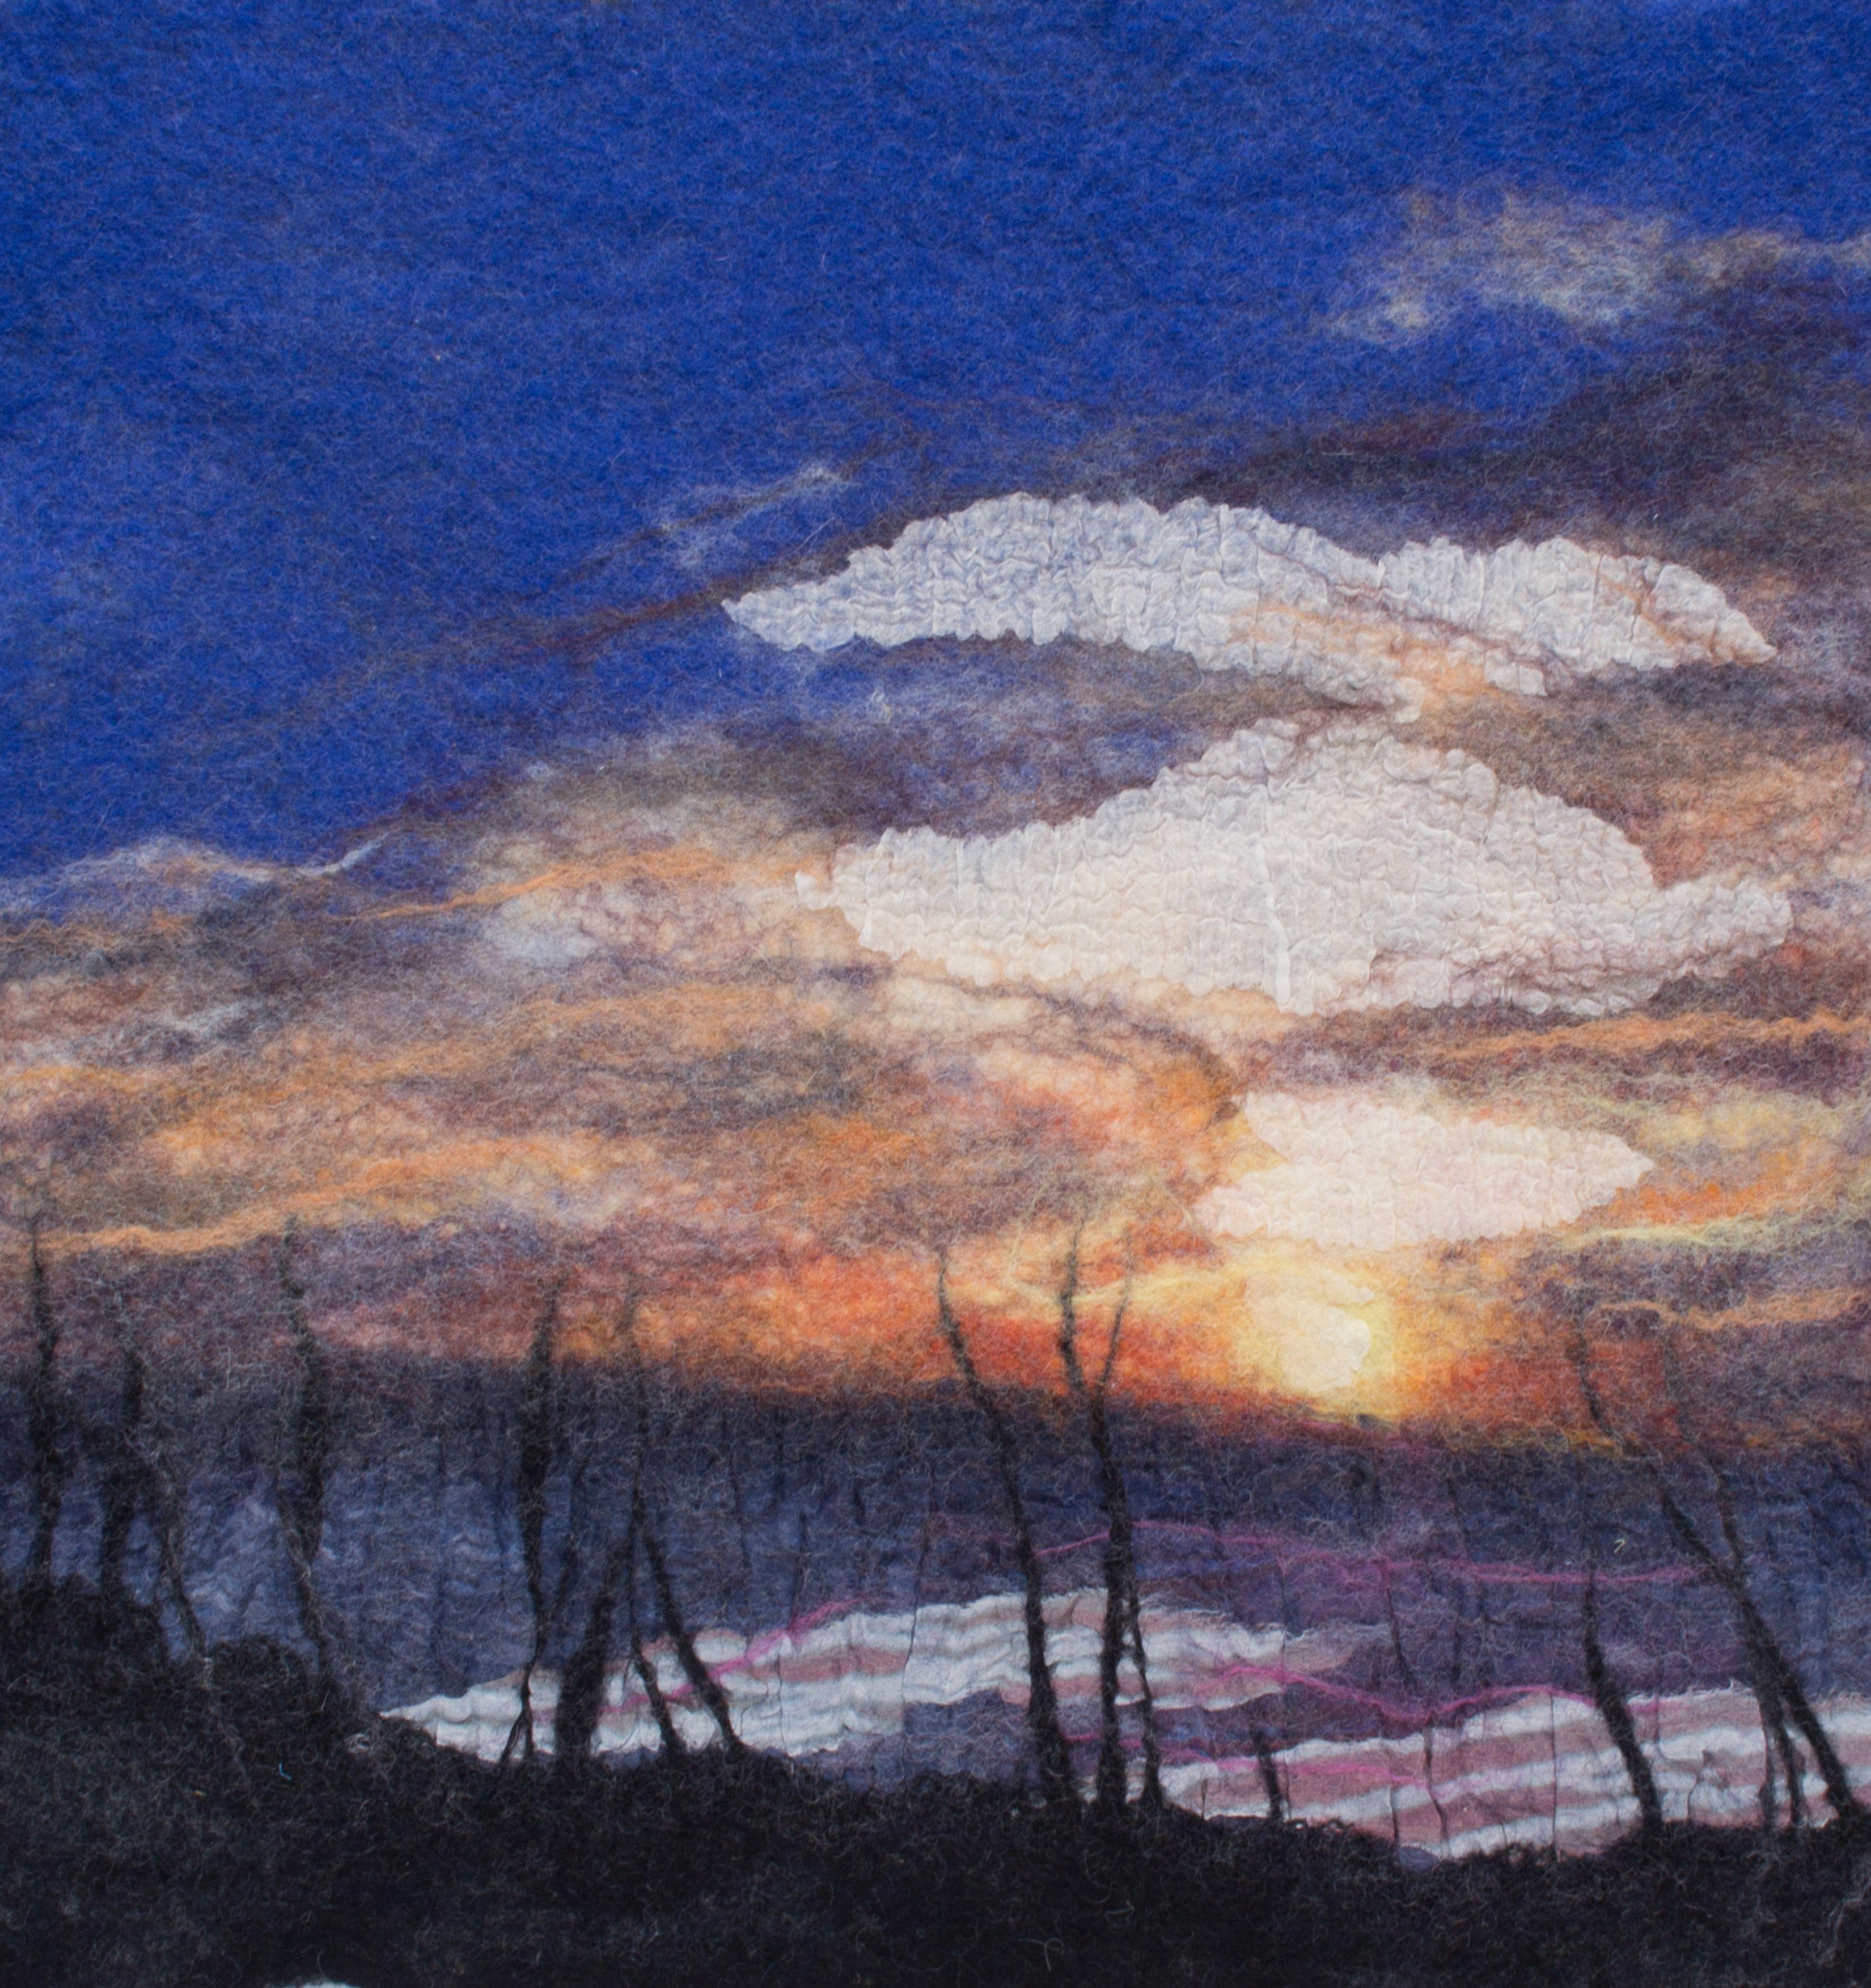 Sunset at Laudermilk Beach Park 12 X 12 Felt Painting